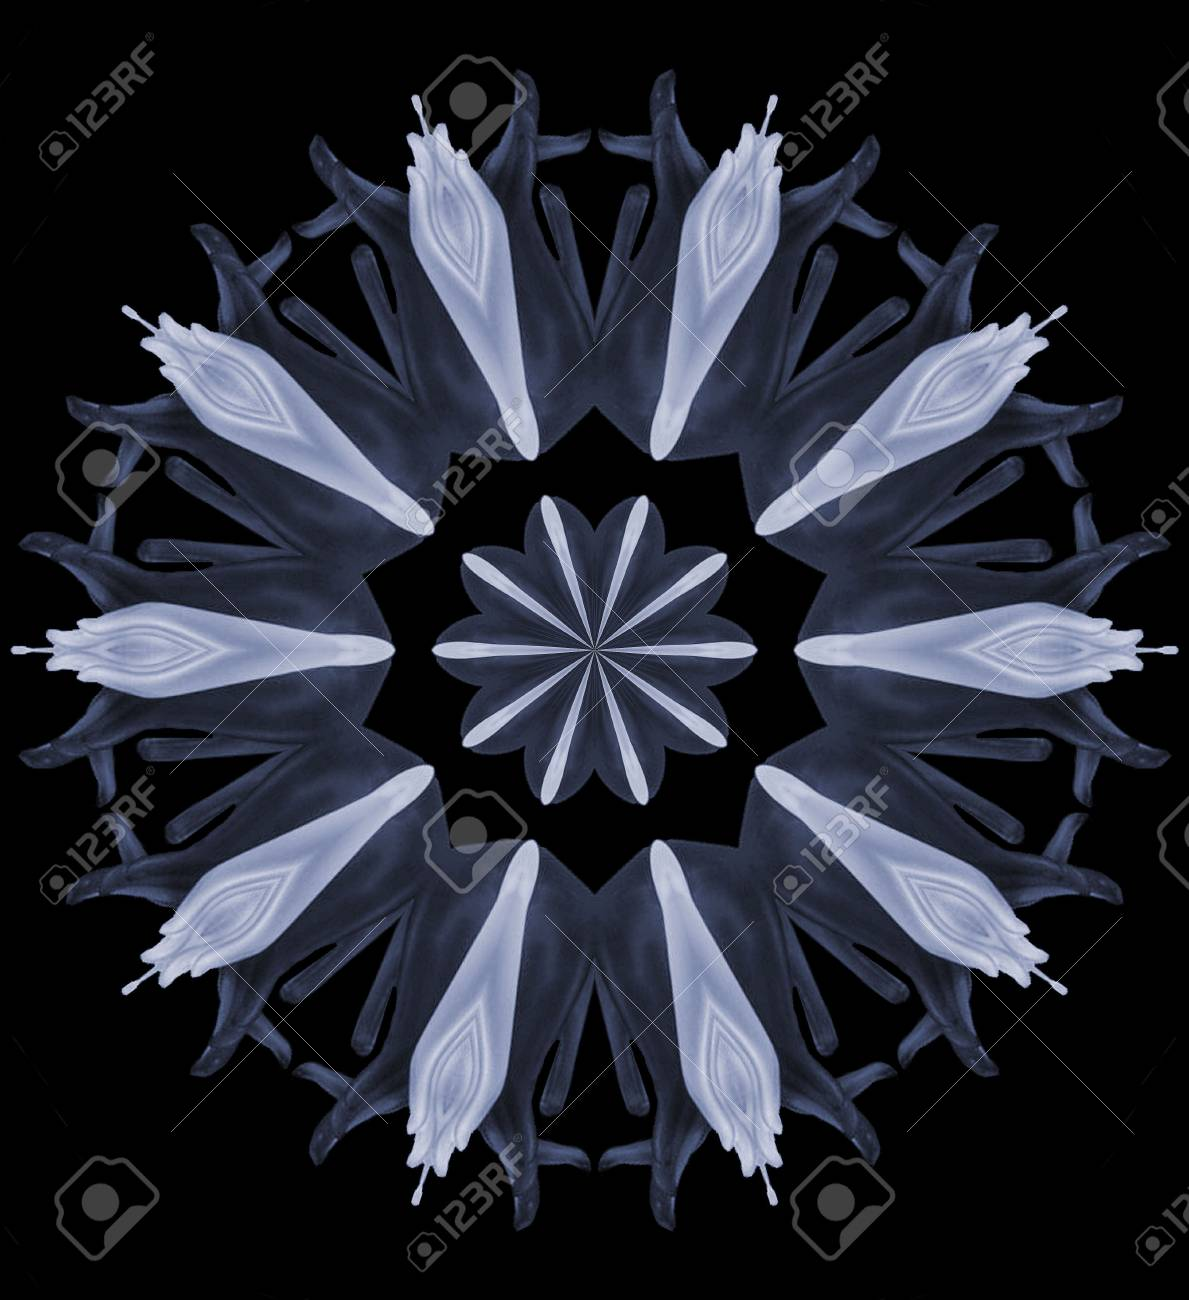 A light blue digital design made out of porcelain hands and flowers